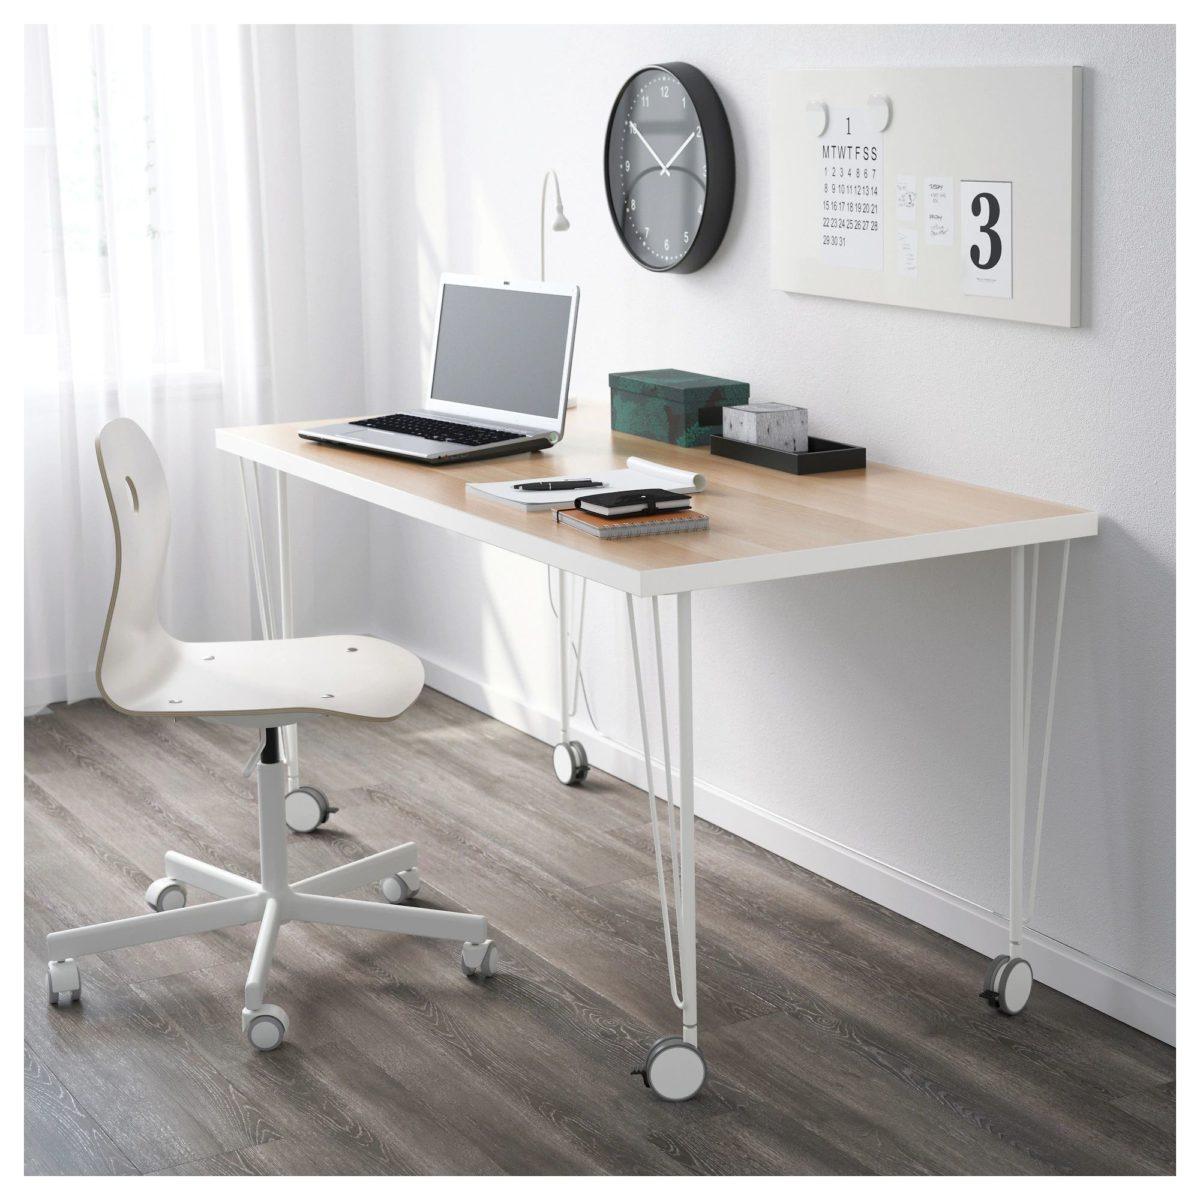 catalogo-ikea-ufficio-2019-scrivania-likant